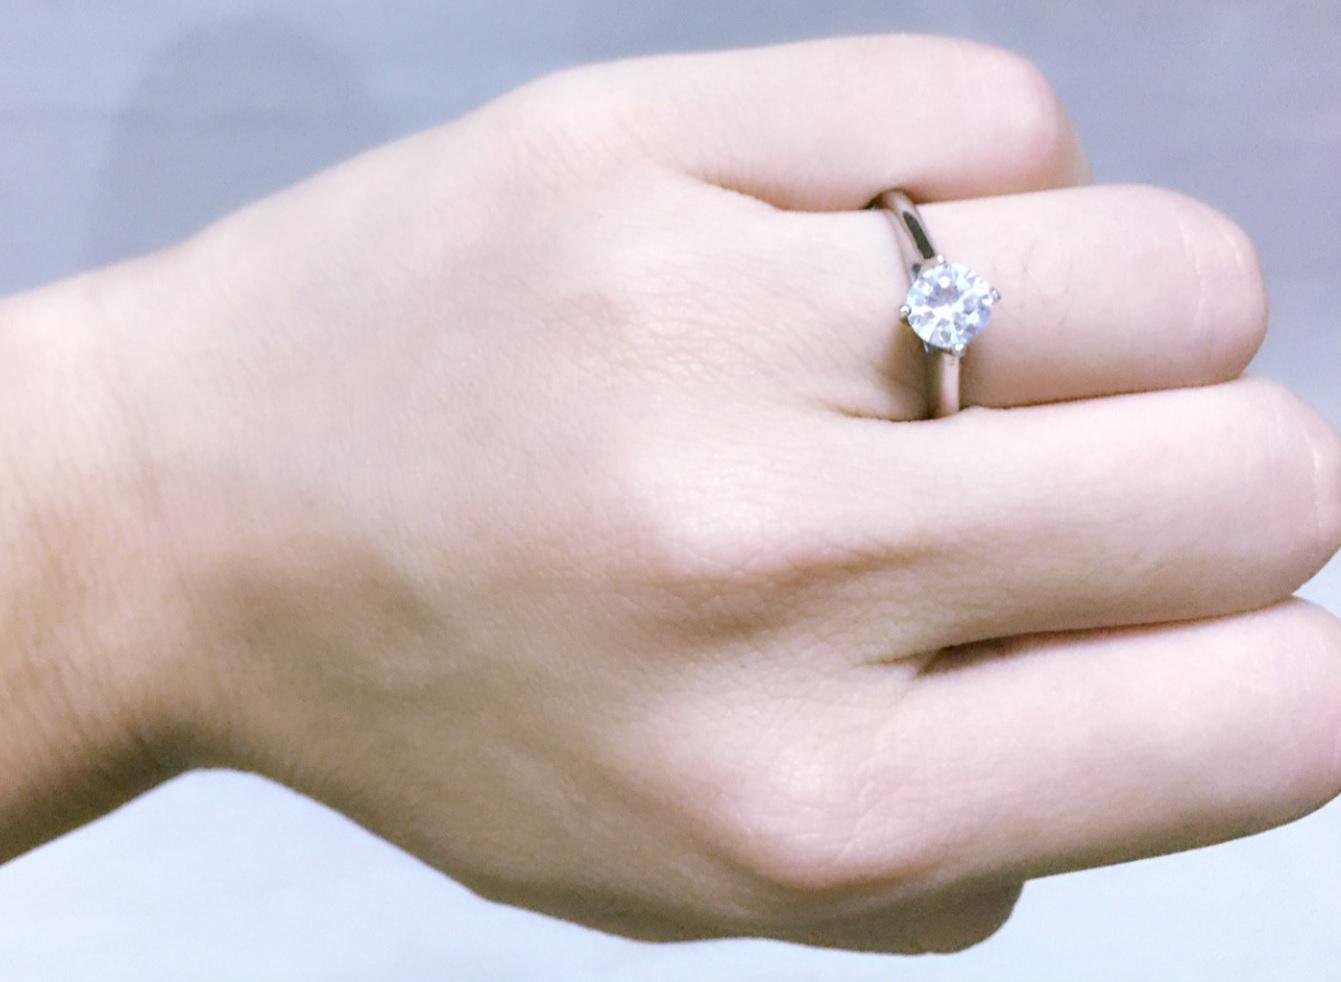 cremation-diamond-jewelry-ring-updated-